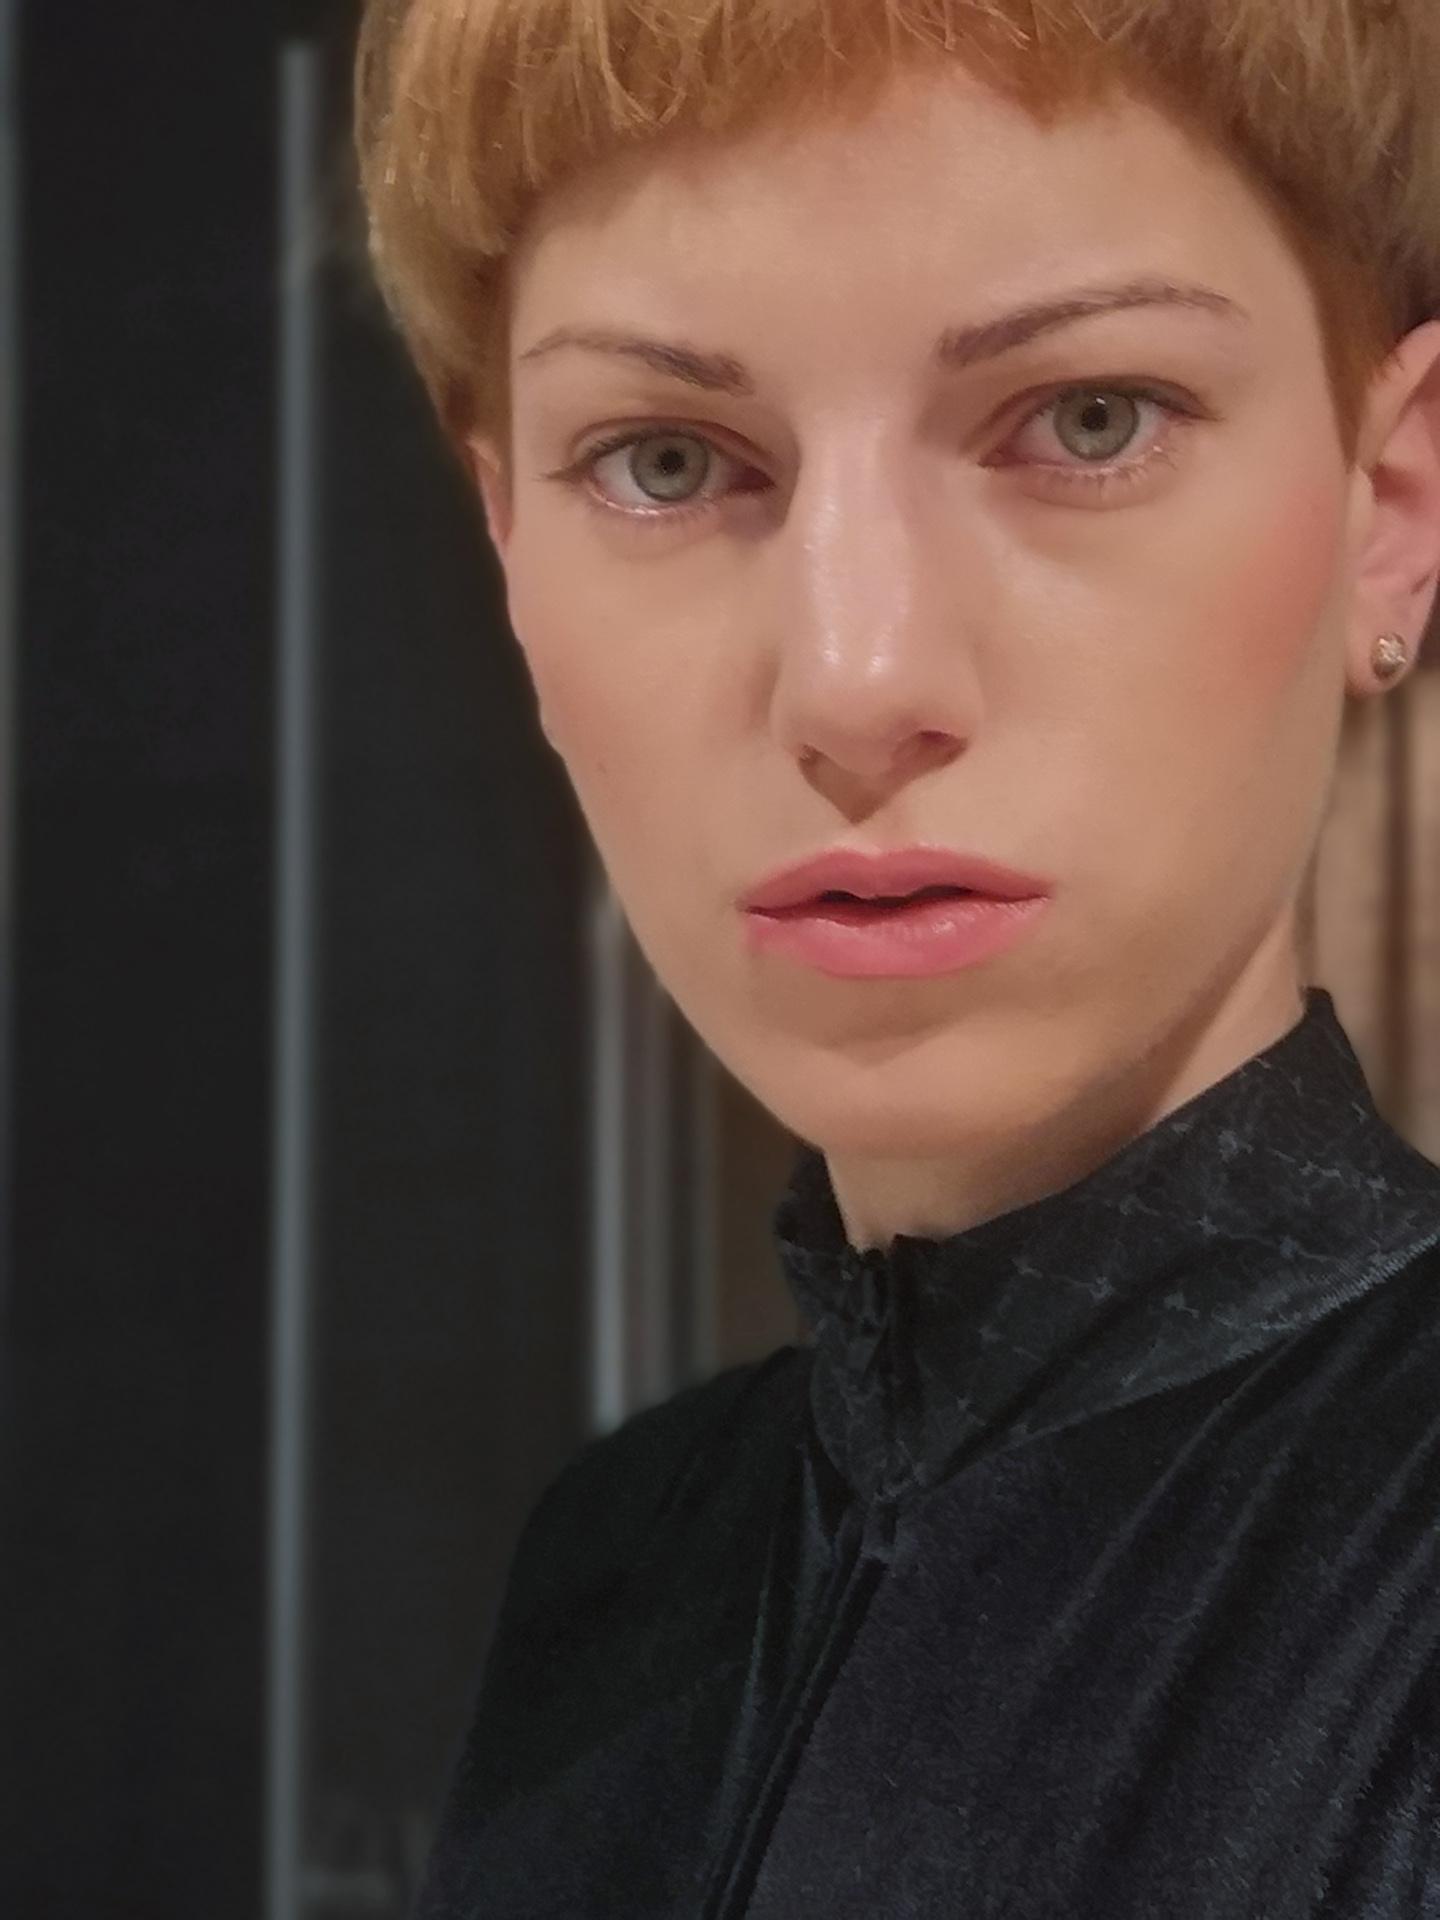 Roberta Ferrara